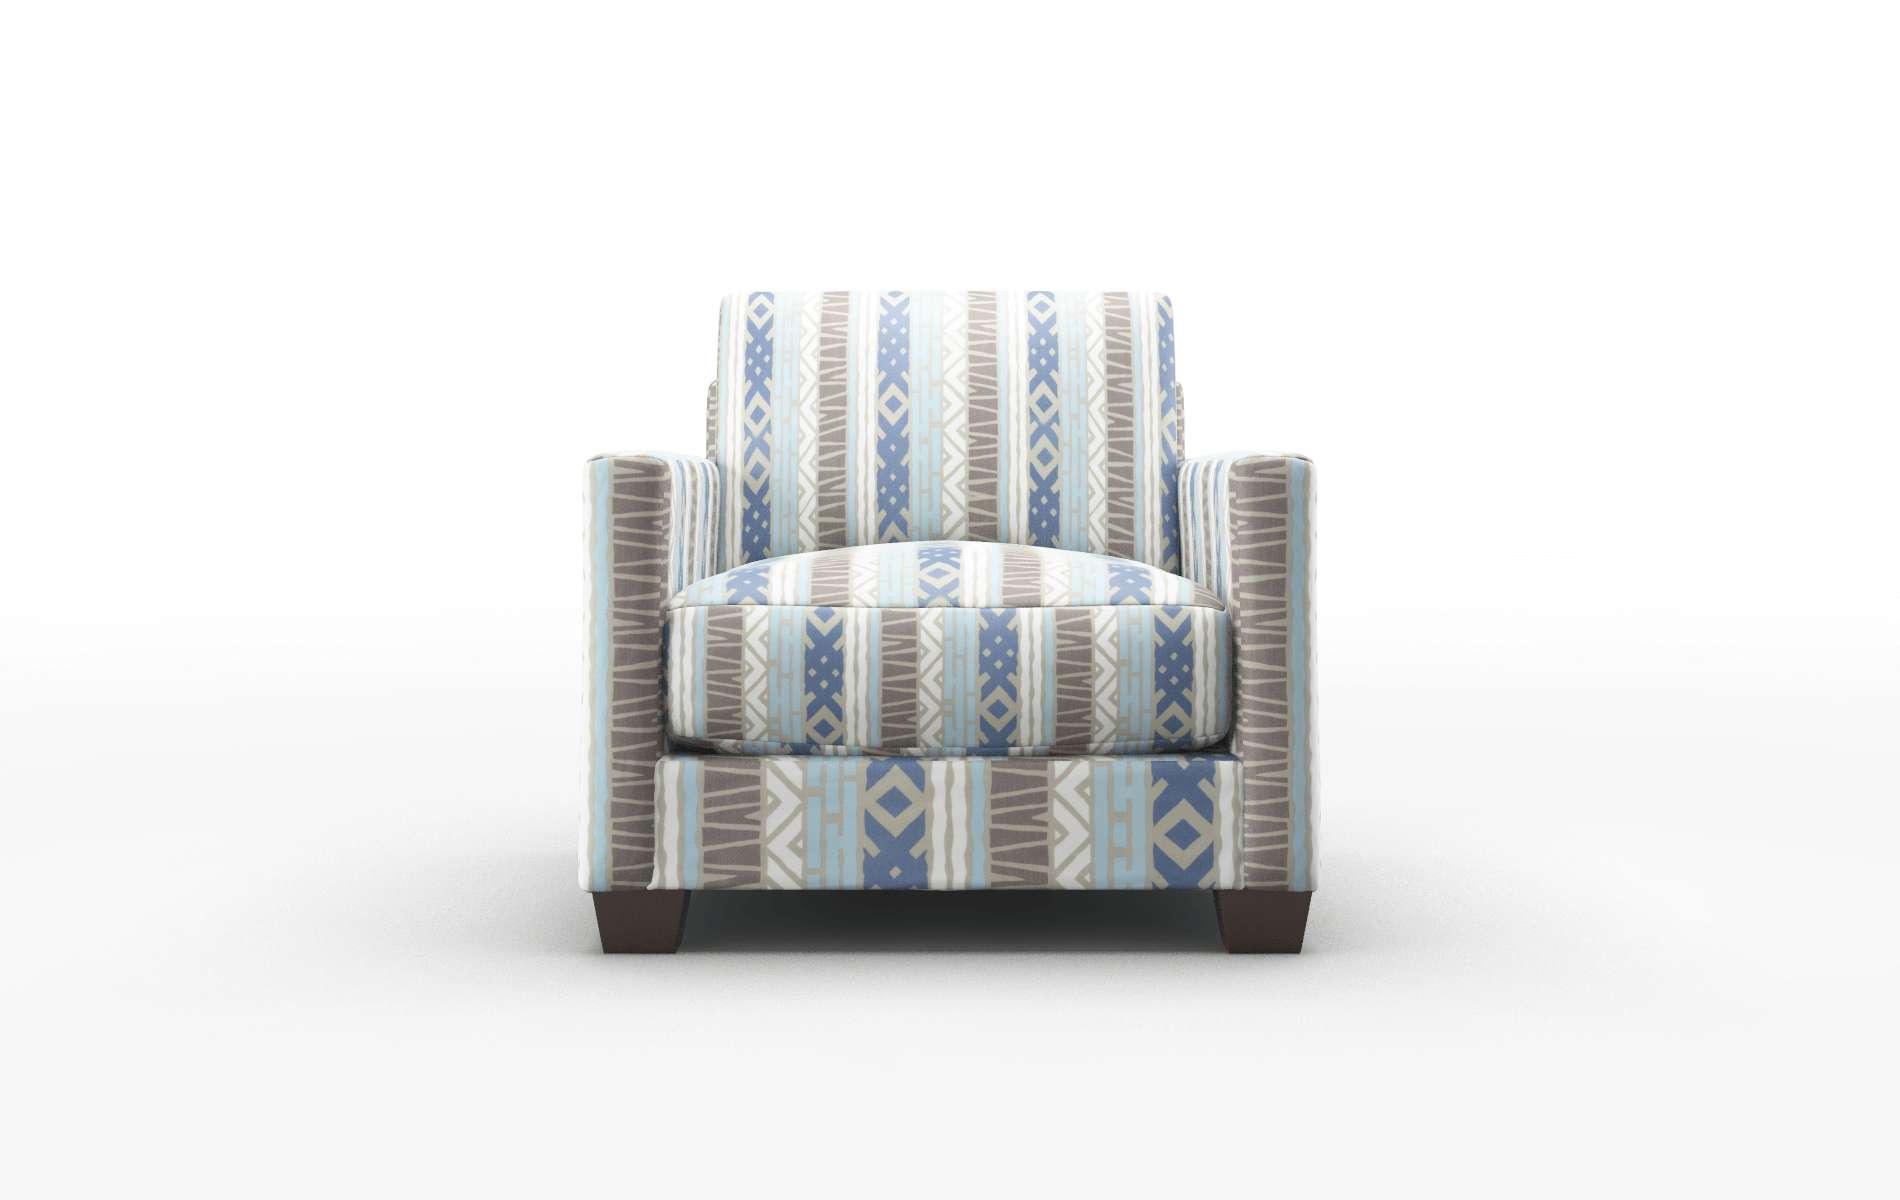 Dresden Bodhi Indigo chair espresso legs